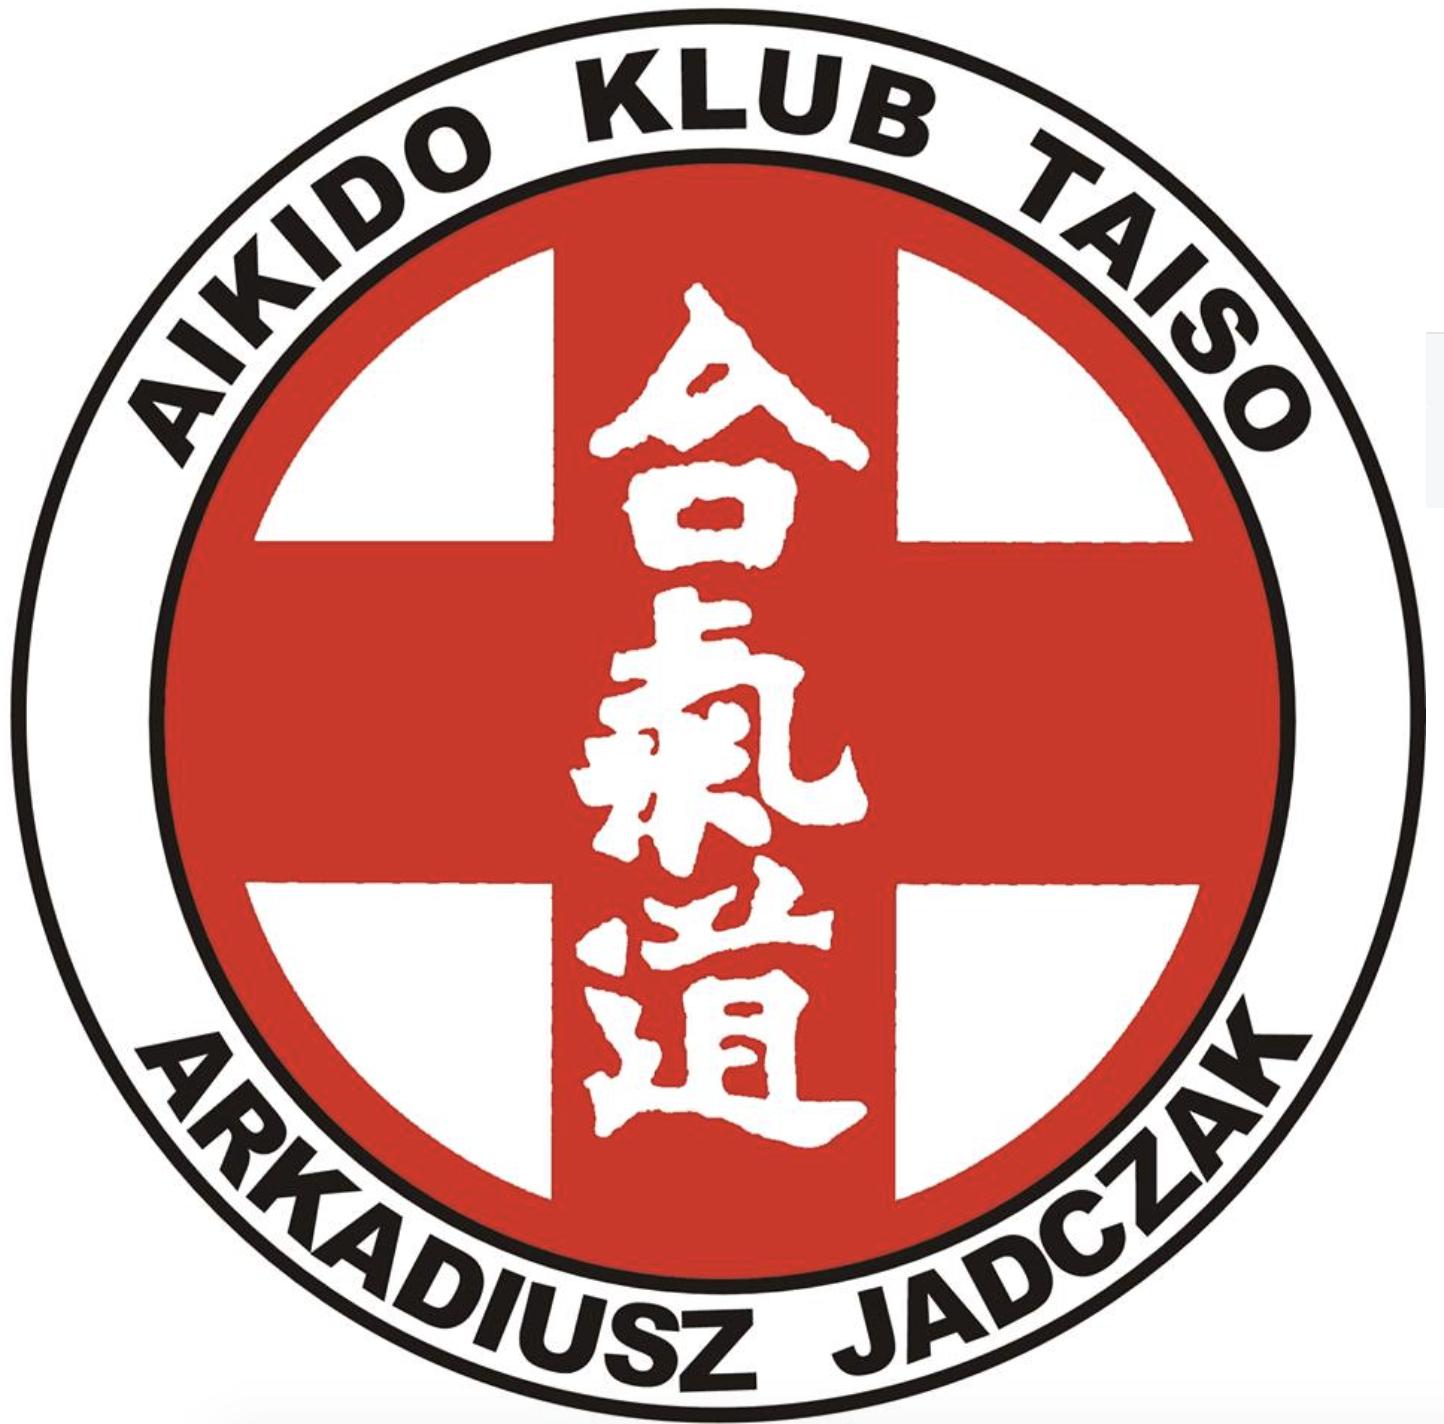 Aikido Klub Taiso Arkadiusz Jadczak 5 Dan Aikido